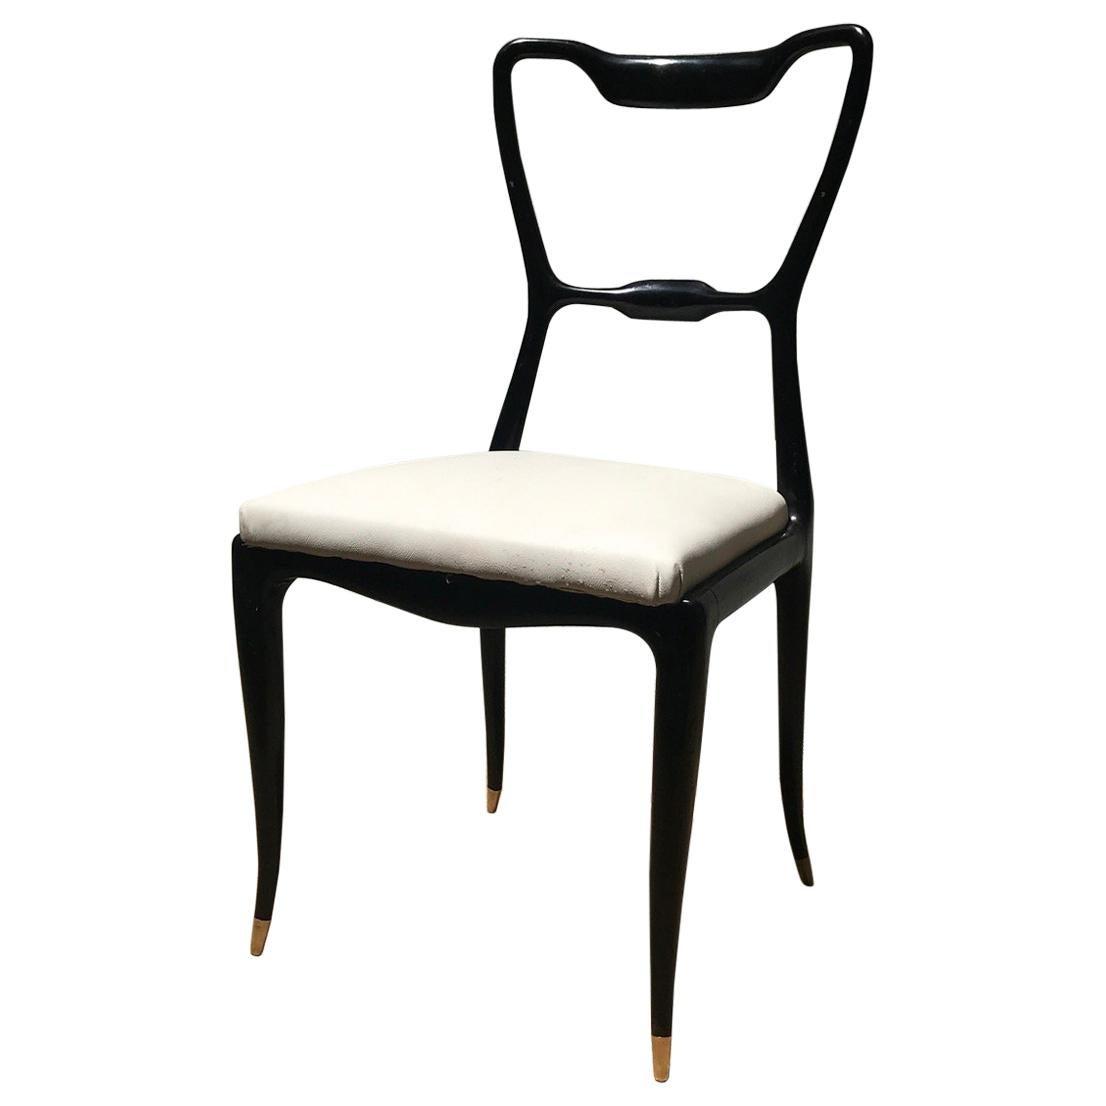 Giuseppe Scapinelli, Set of 10 Ebonized 1950s Brazilian Modern Design Chairs